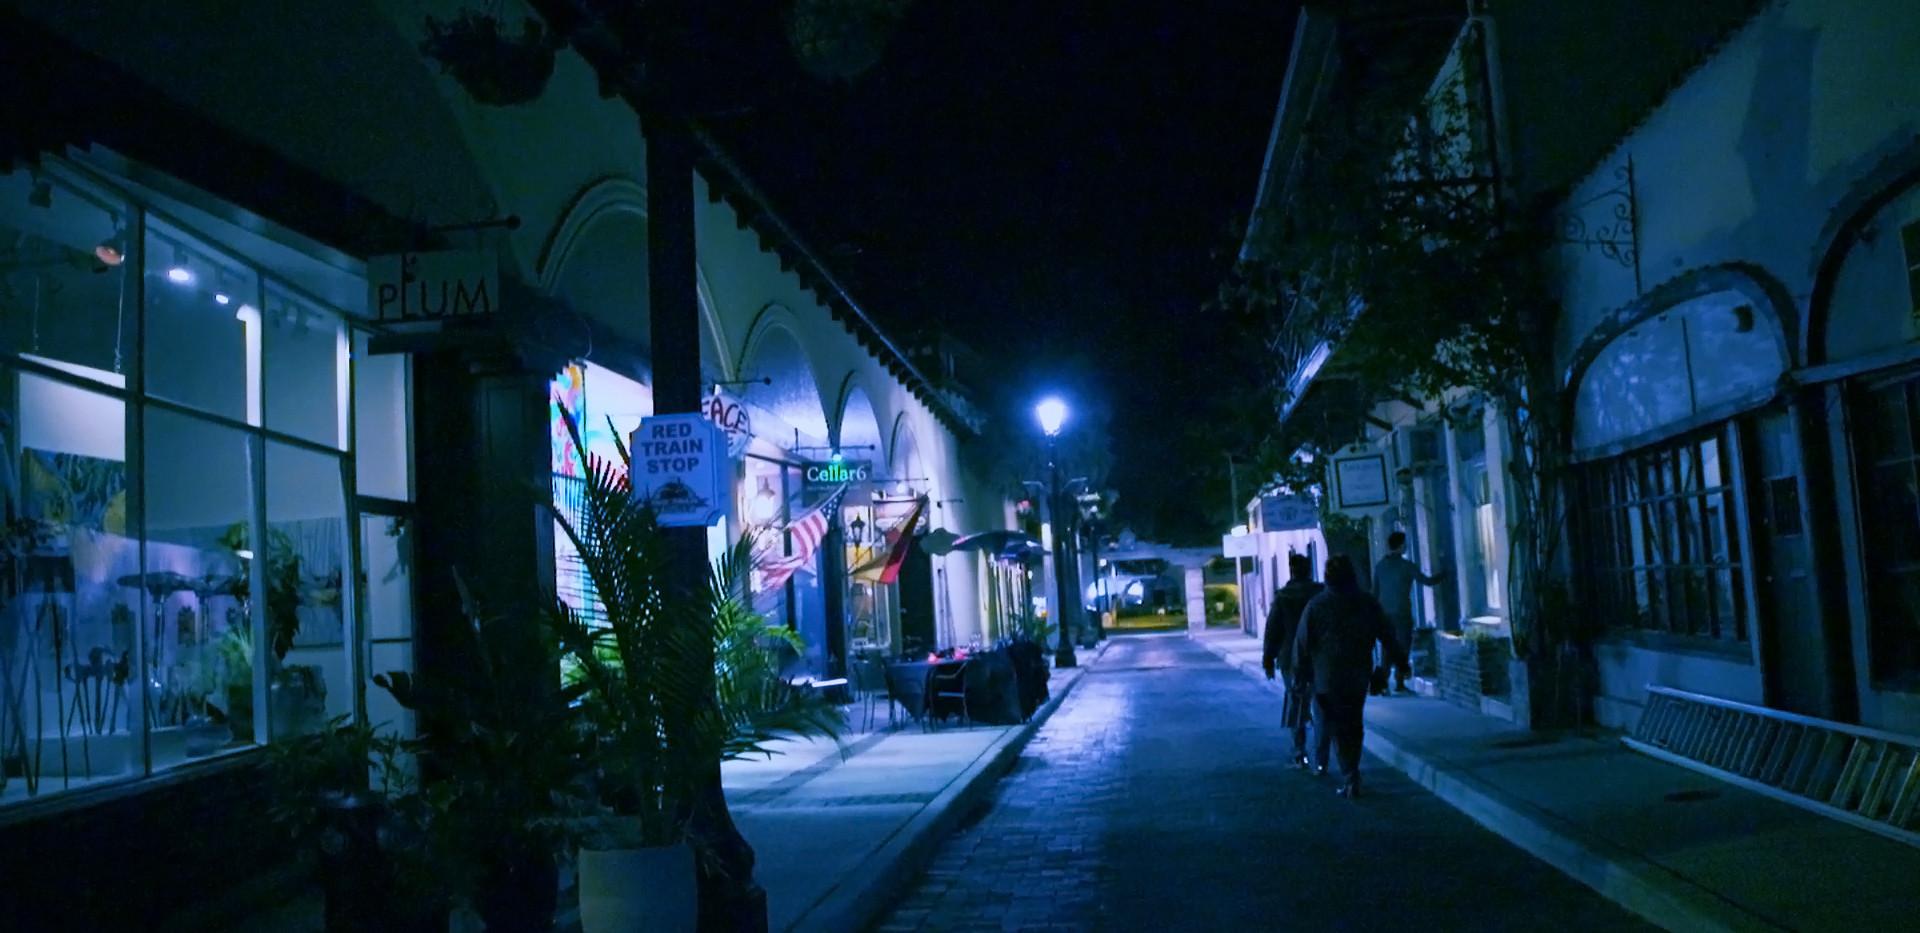 Evil Beneath the Oldest Street in America